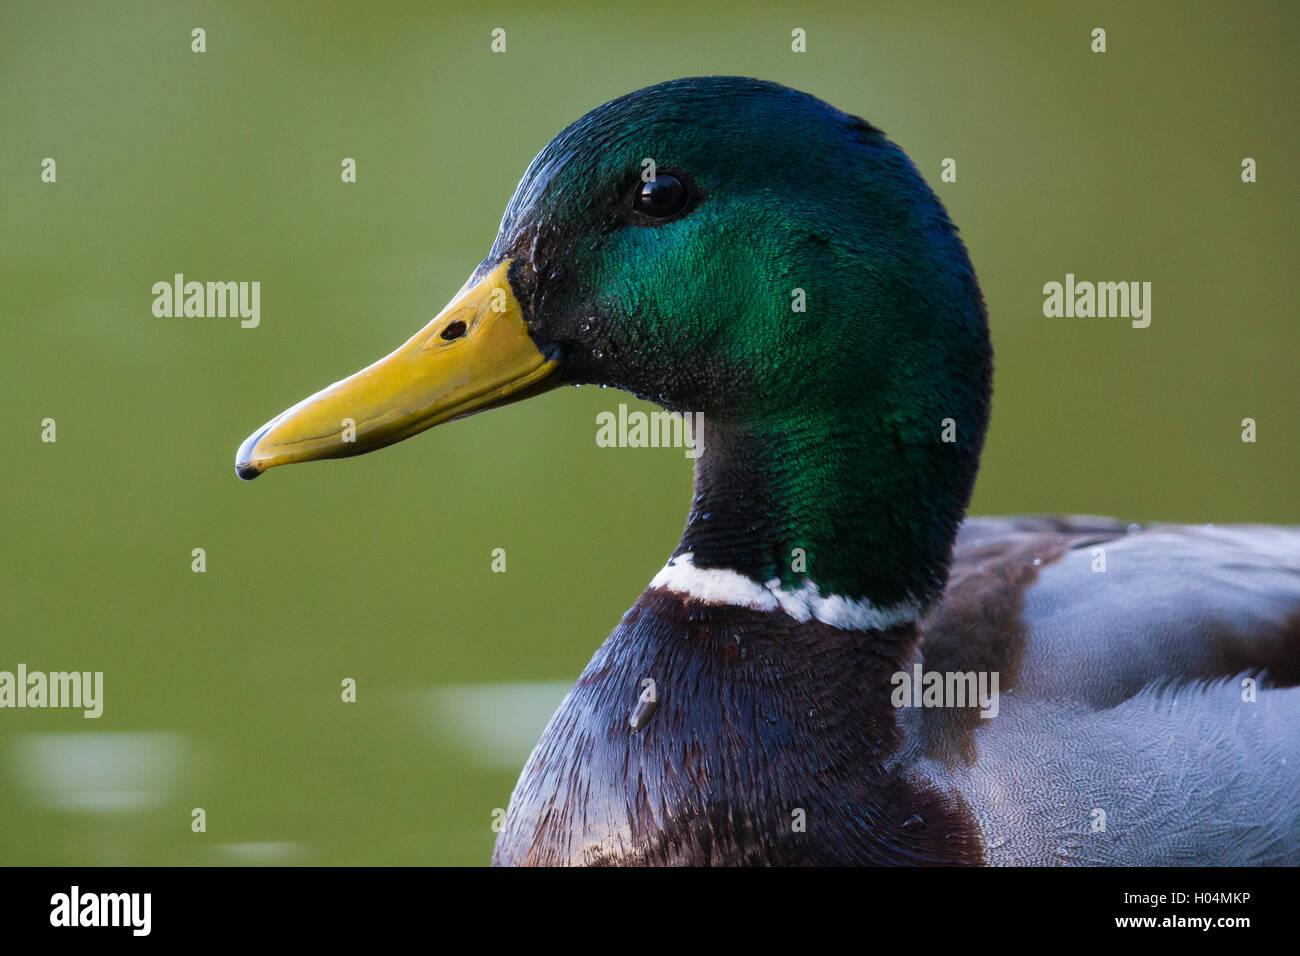 Mallard (Anas platyrhynchos), adult close-up - Stock Image